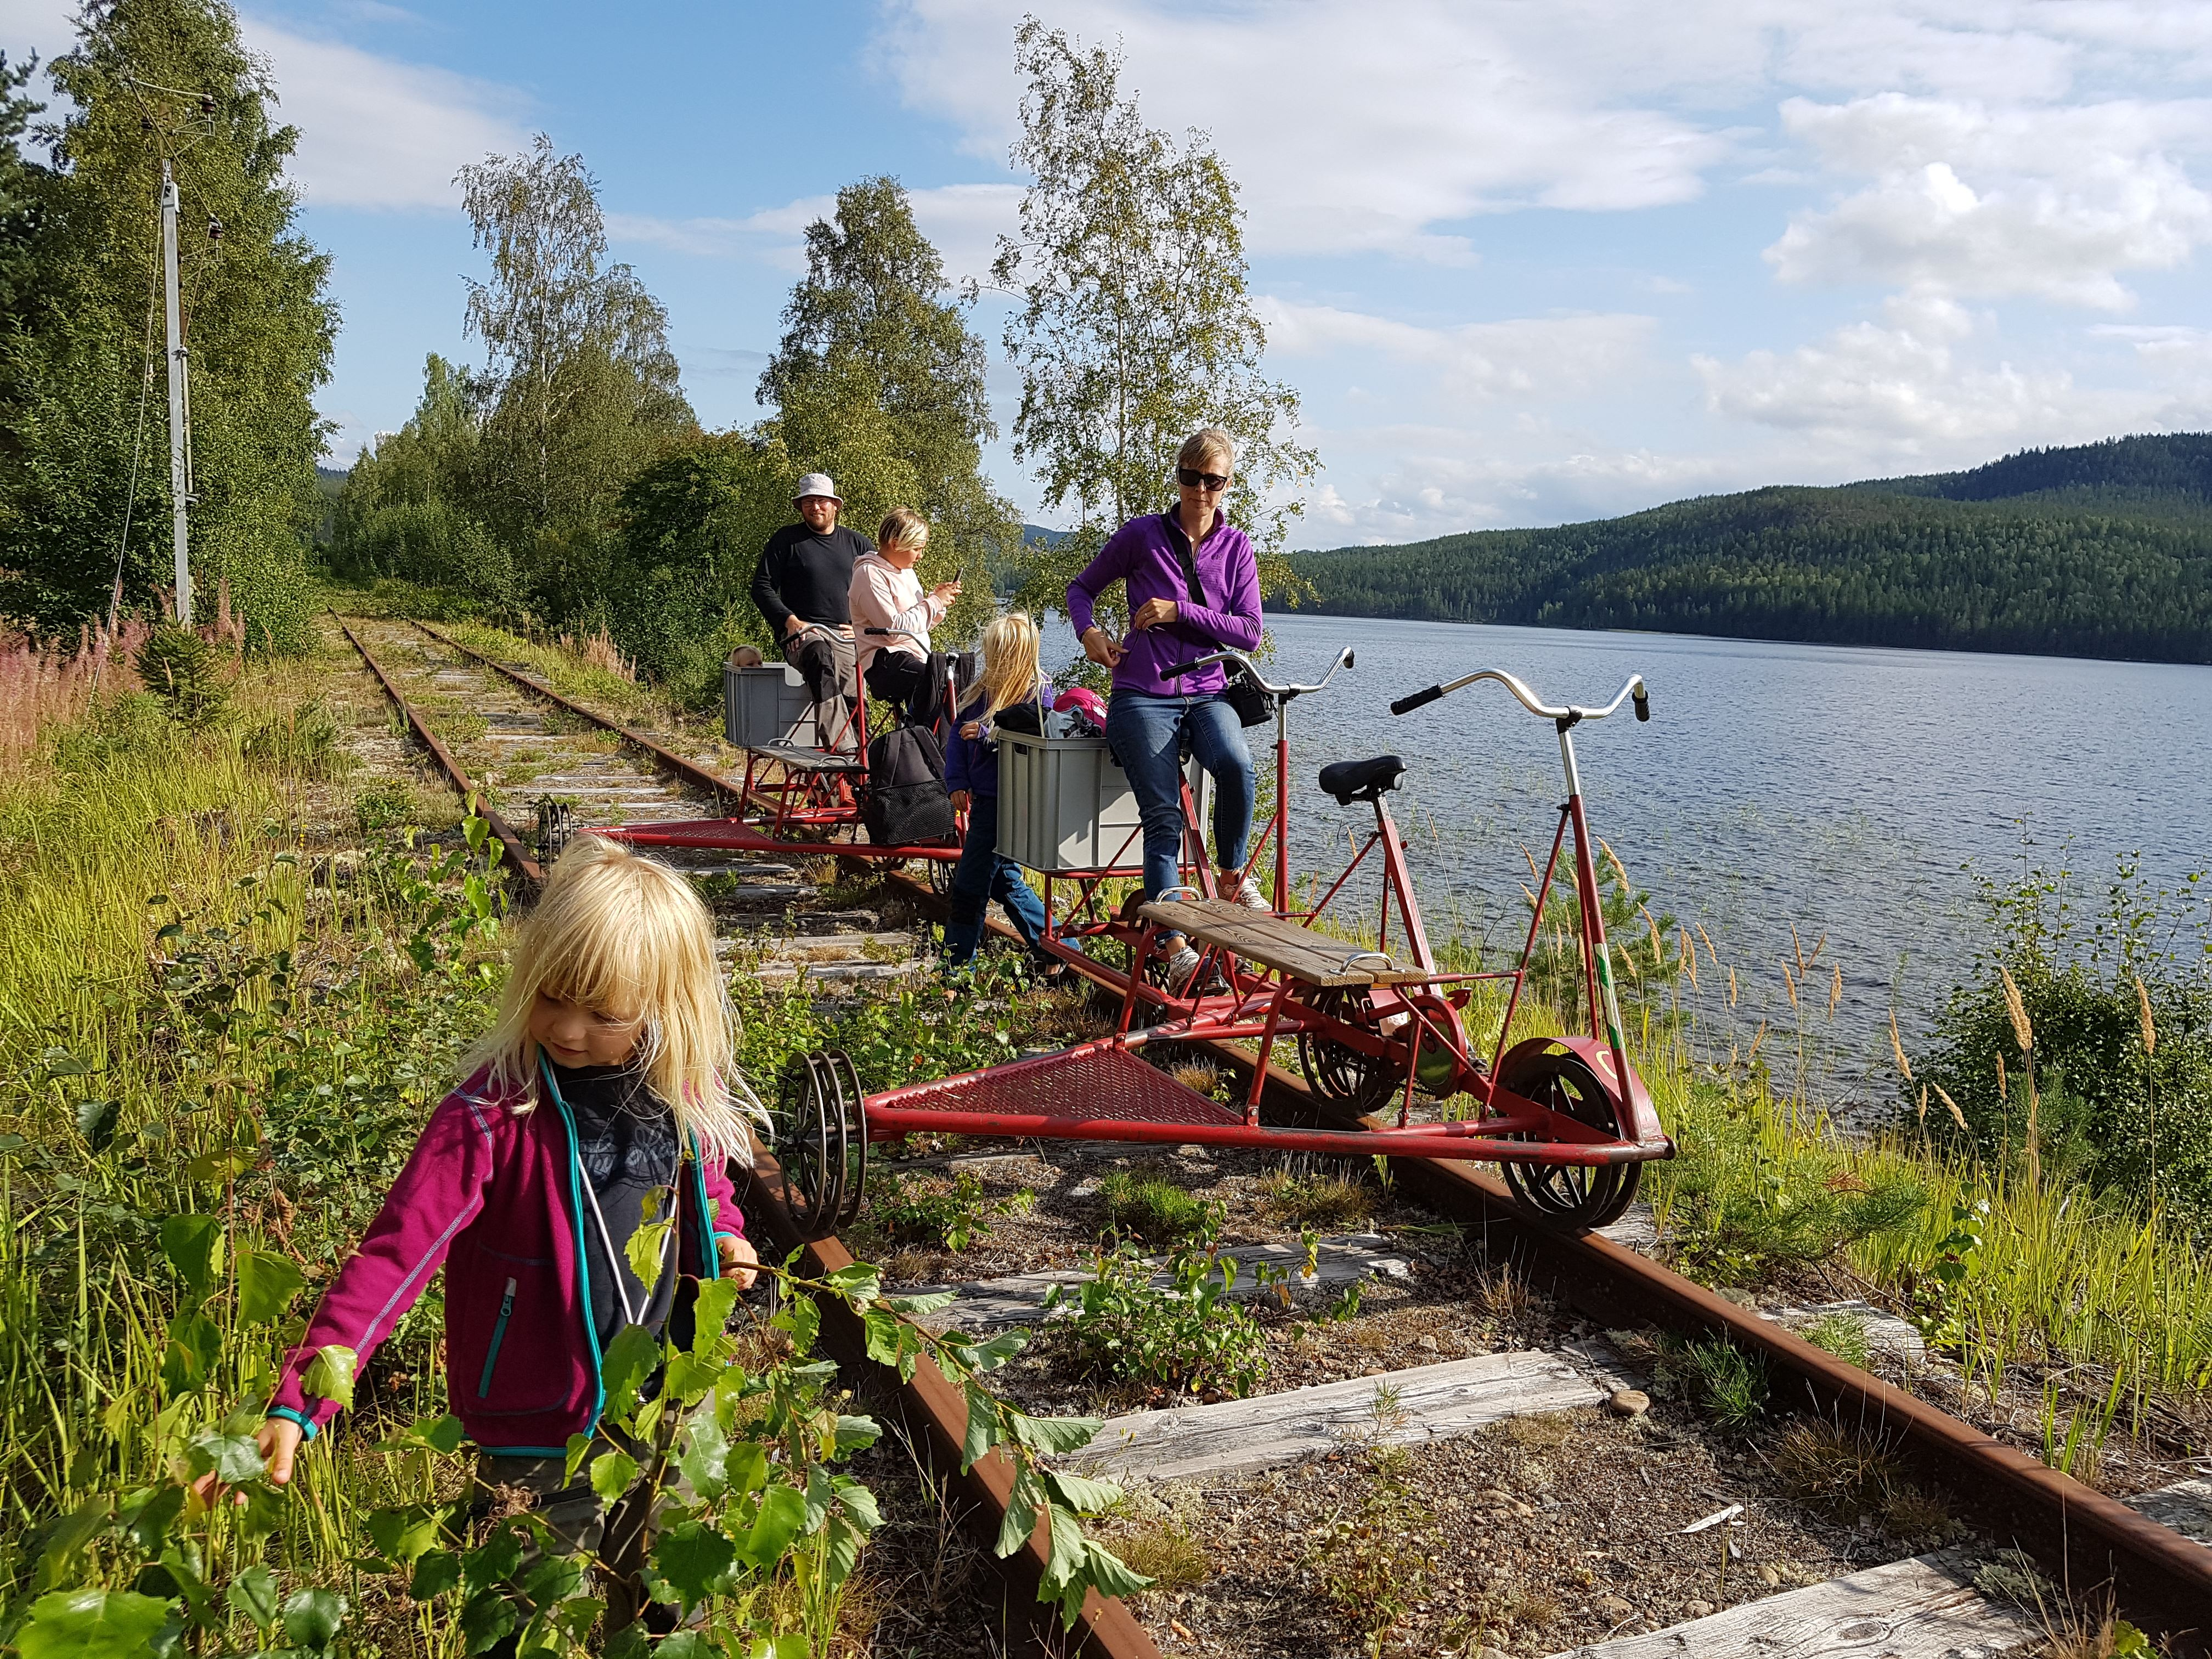 Fredric Berg, Rail trolley riding on Dellenbanan (the Dellen railroad)